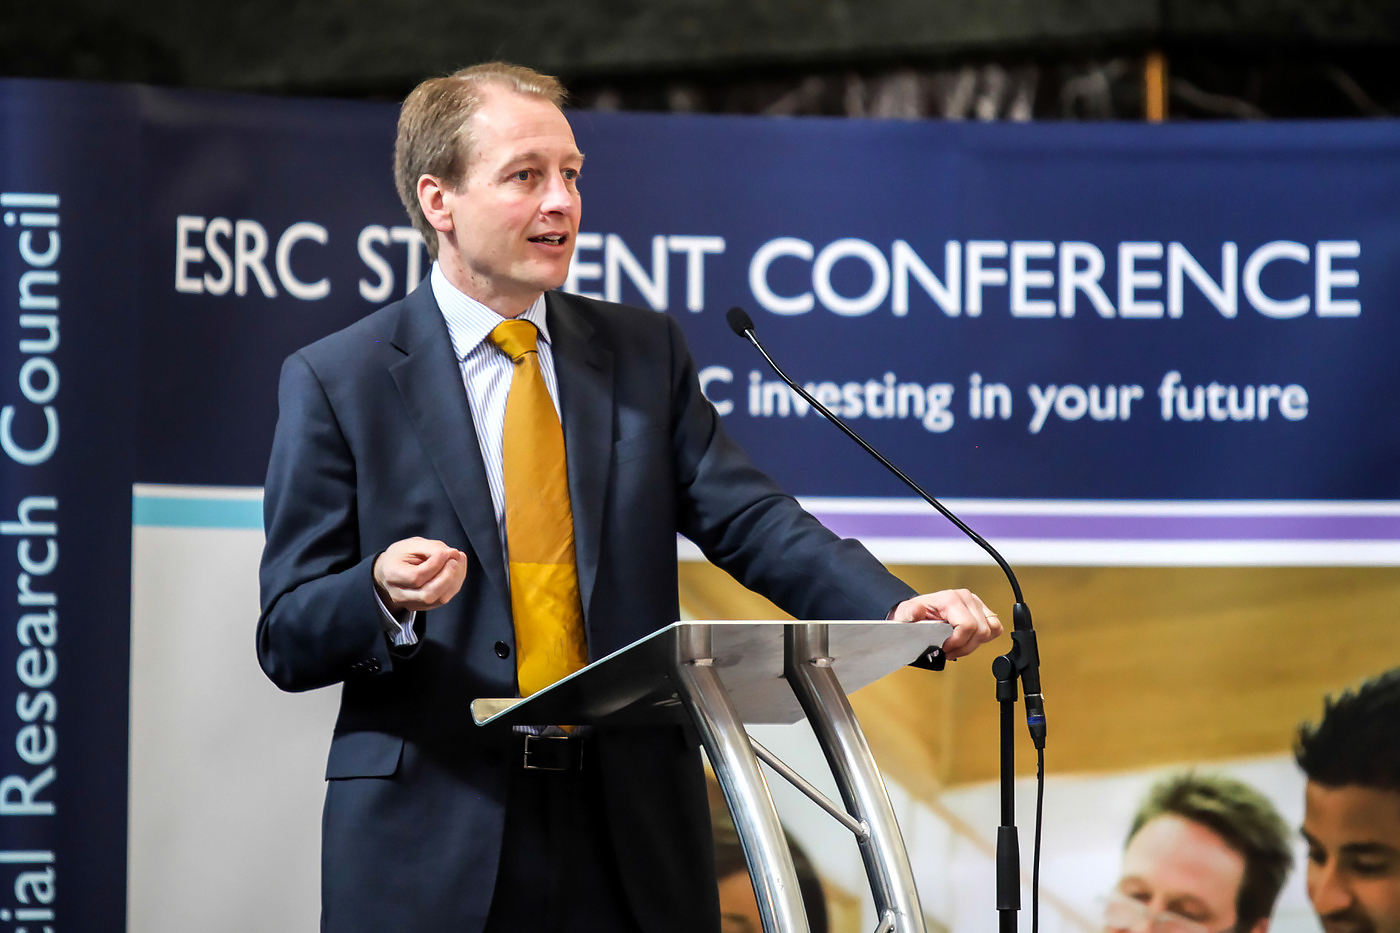 ESRC Conference